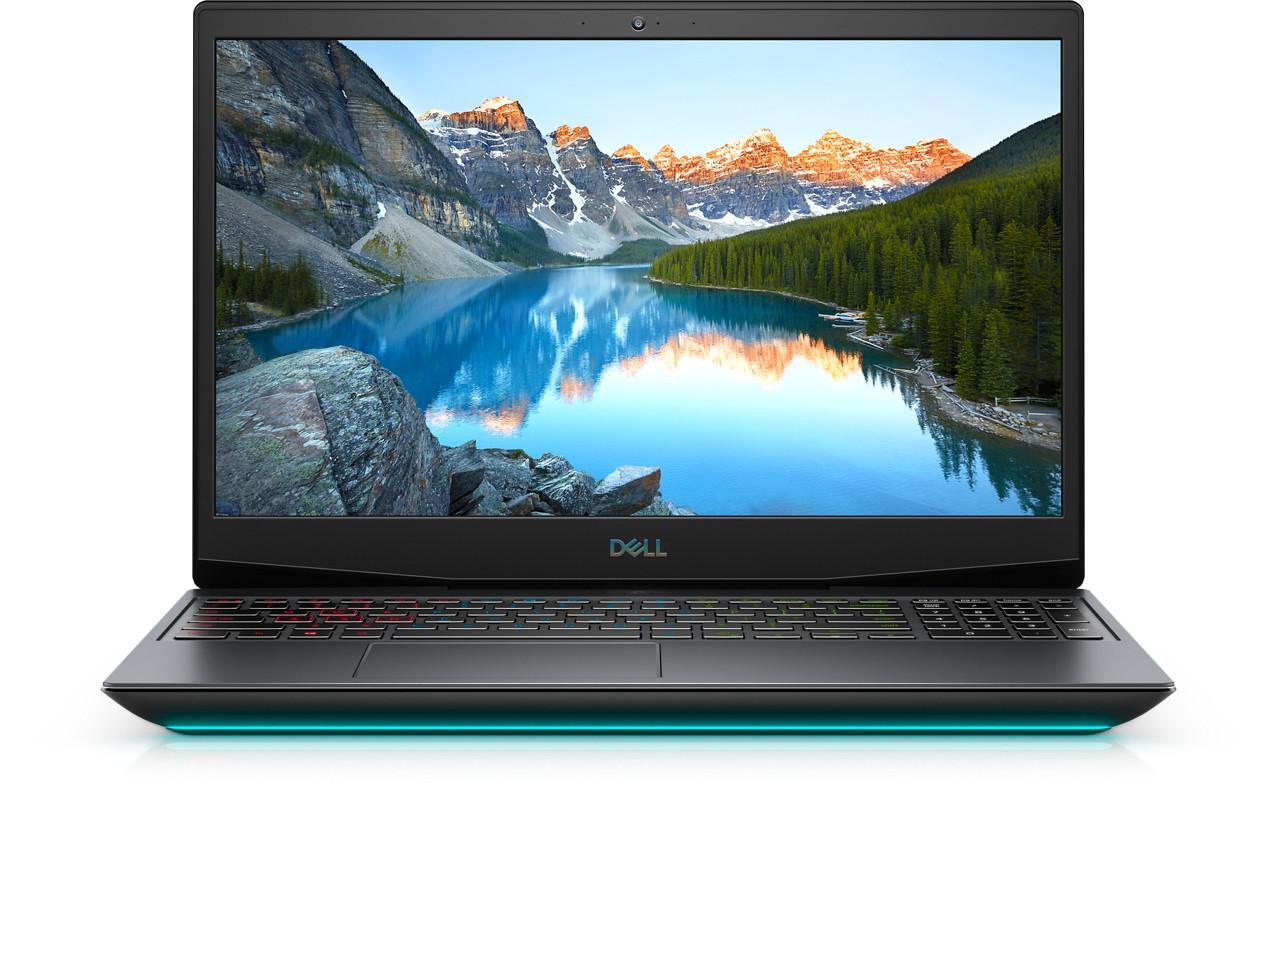 "Laptop Dell Inspiron Gaming 5500 G5, 15.6"" FHD, i5-10300H, 8GB, 512GB SSD, GeForce GTX 1650TI, Ubuntu - imaginea 1"